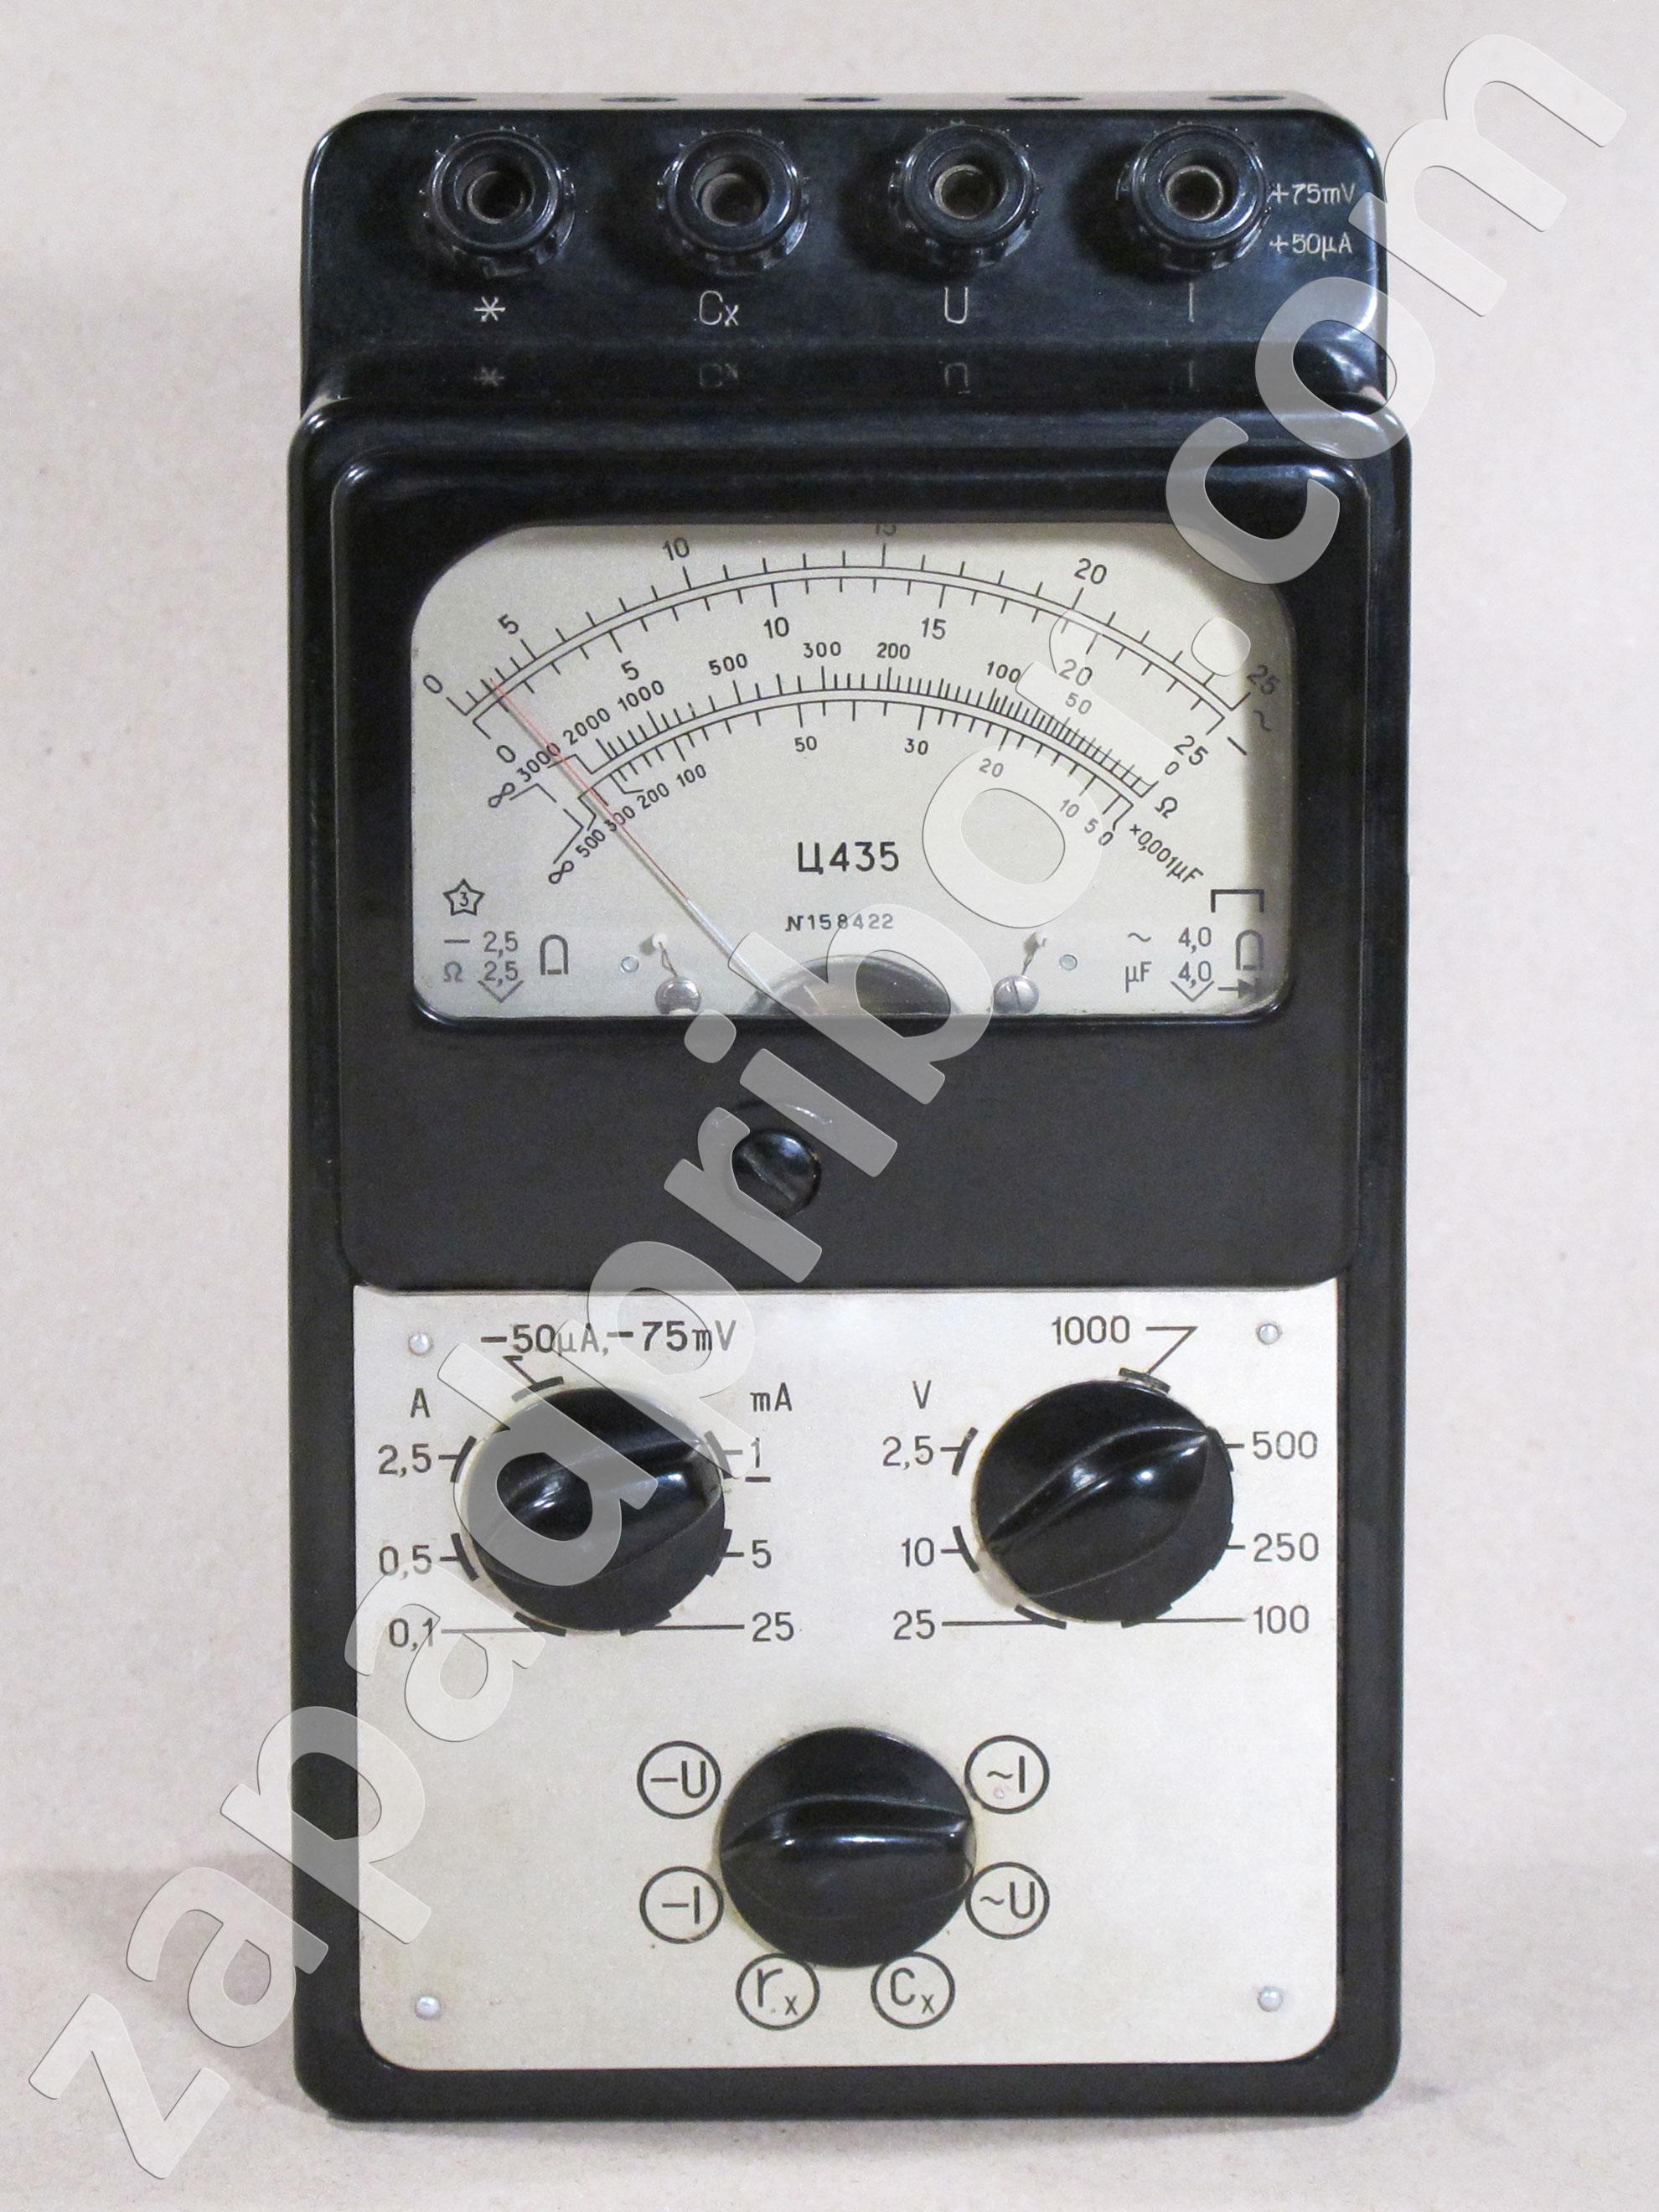 Схема комбинированного прибора ц435